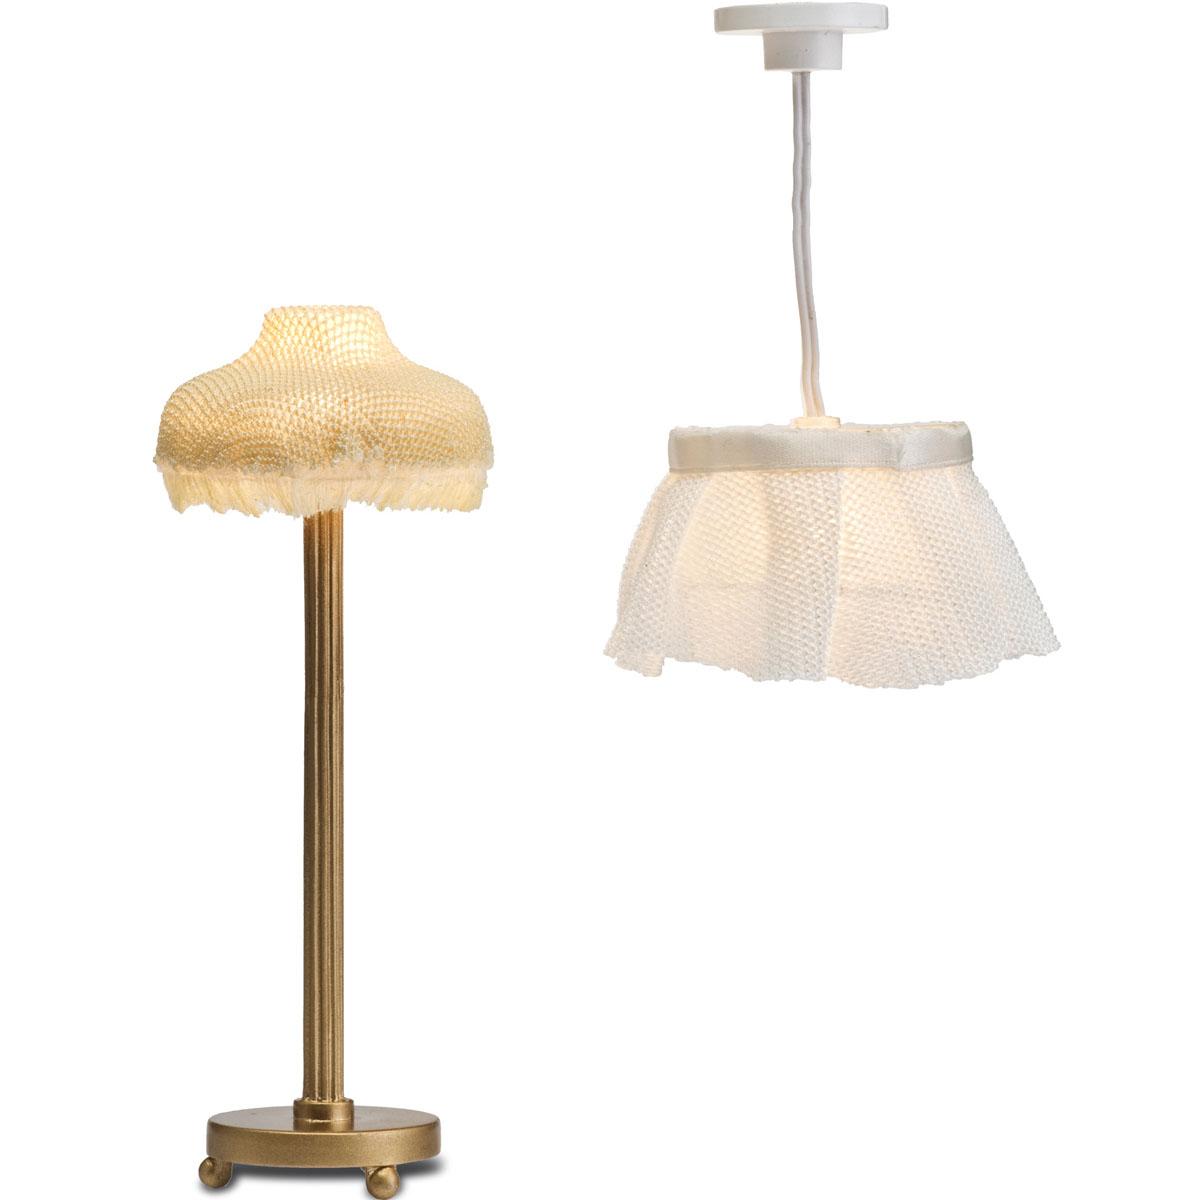 Lundby lampenset lampen lampe 1 18 zubeh r puppenzubeh r for Lampen puppenhaus